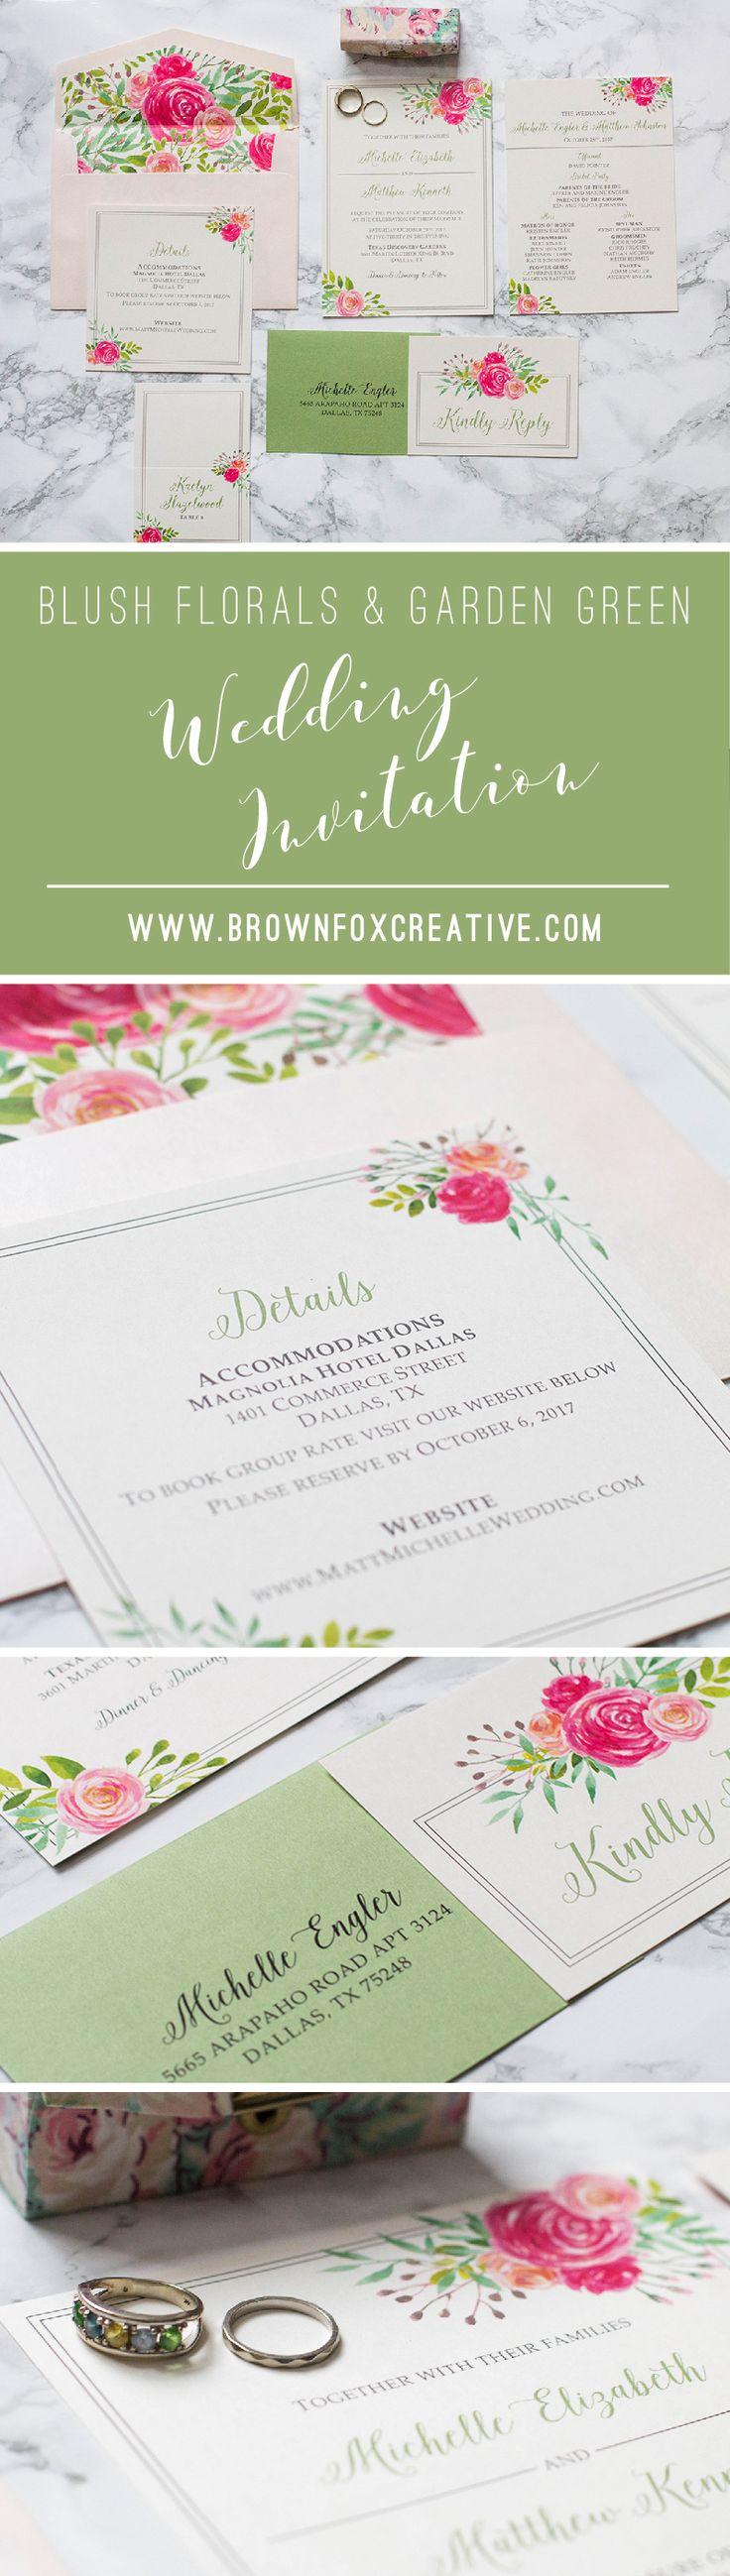 how to return address wedding envelopes%0A Blush Pink and Garden Green Water Color Floral Wedding Invitation  Includes  Envelope Liner  Guest